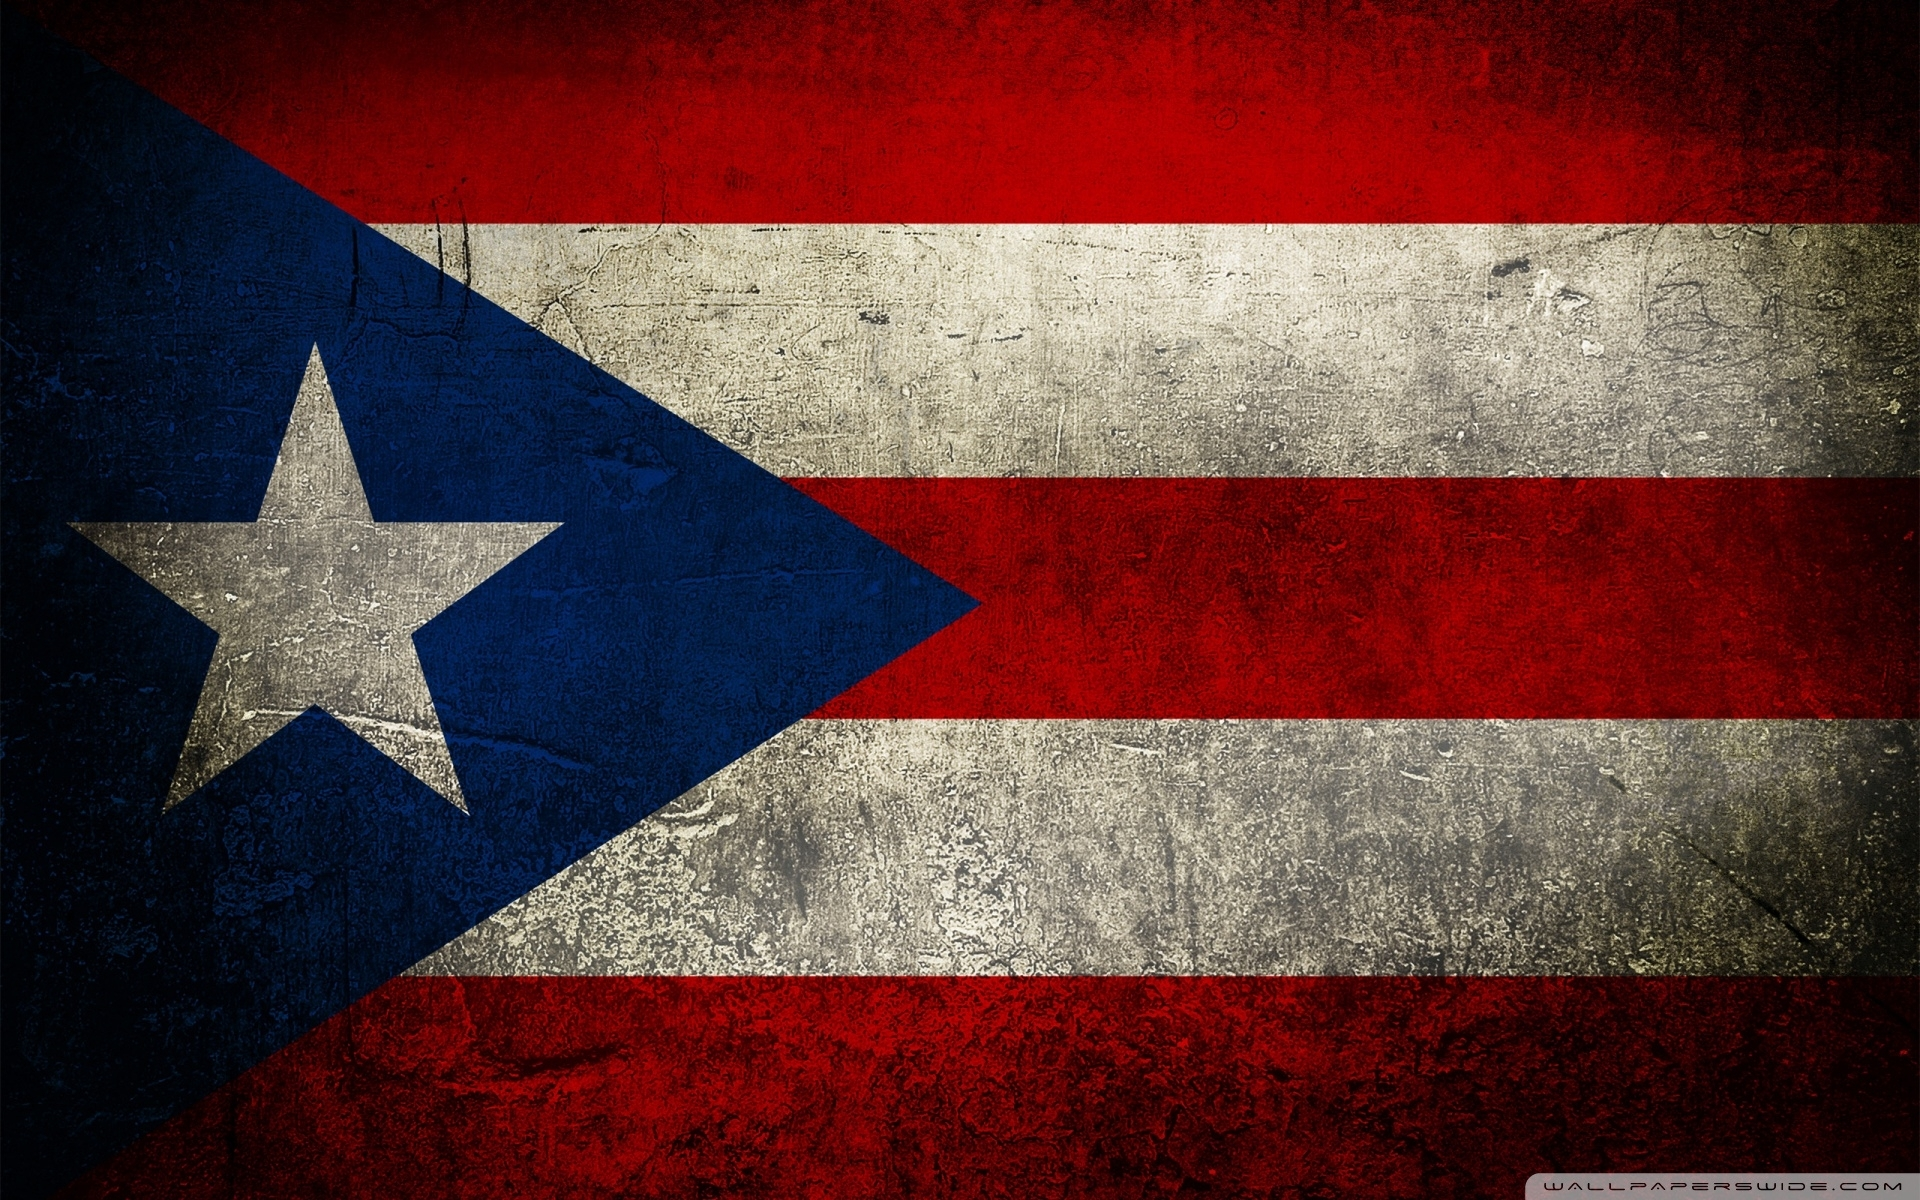 grunge flags of puerto rico ❤ 4k hd desktop wallpaper for 4k ultra